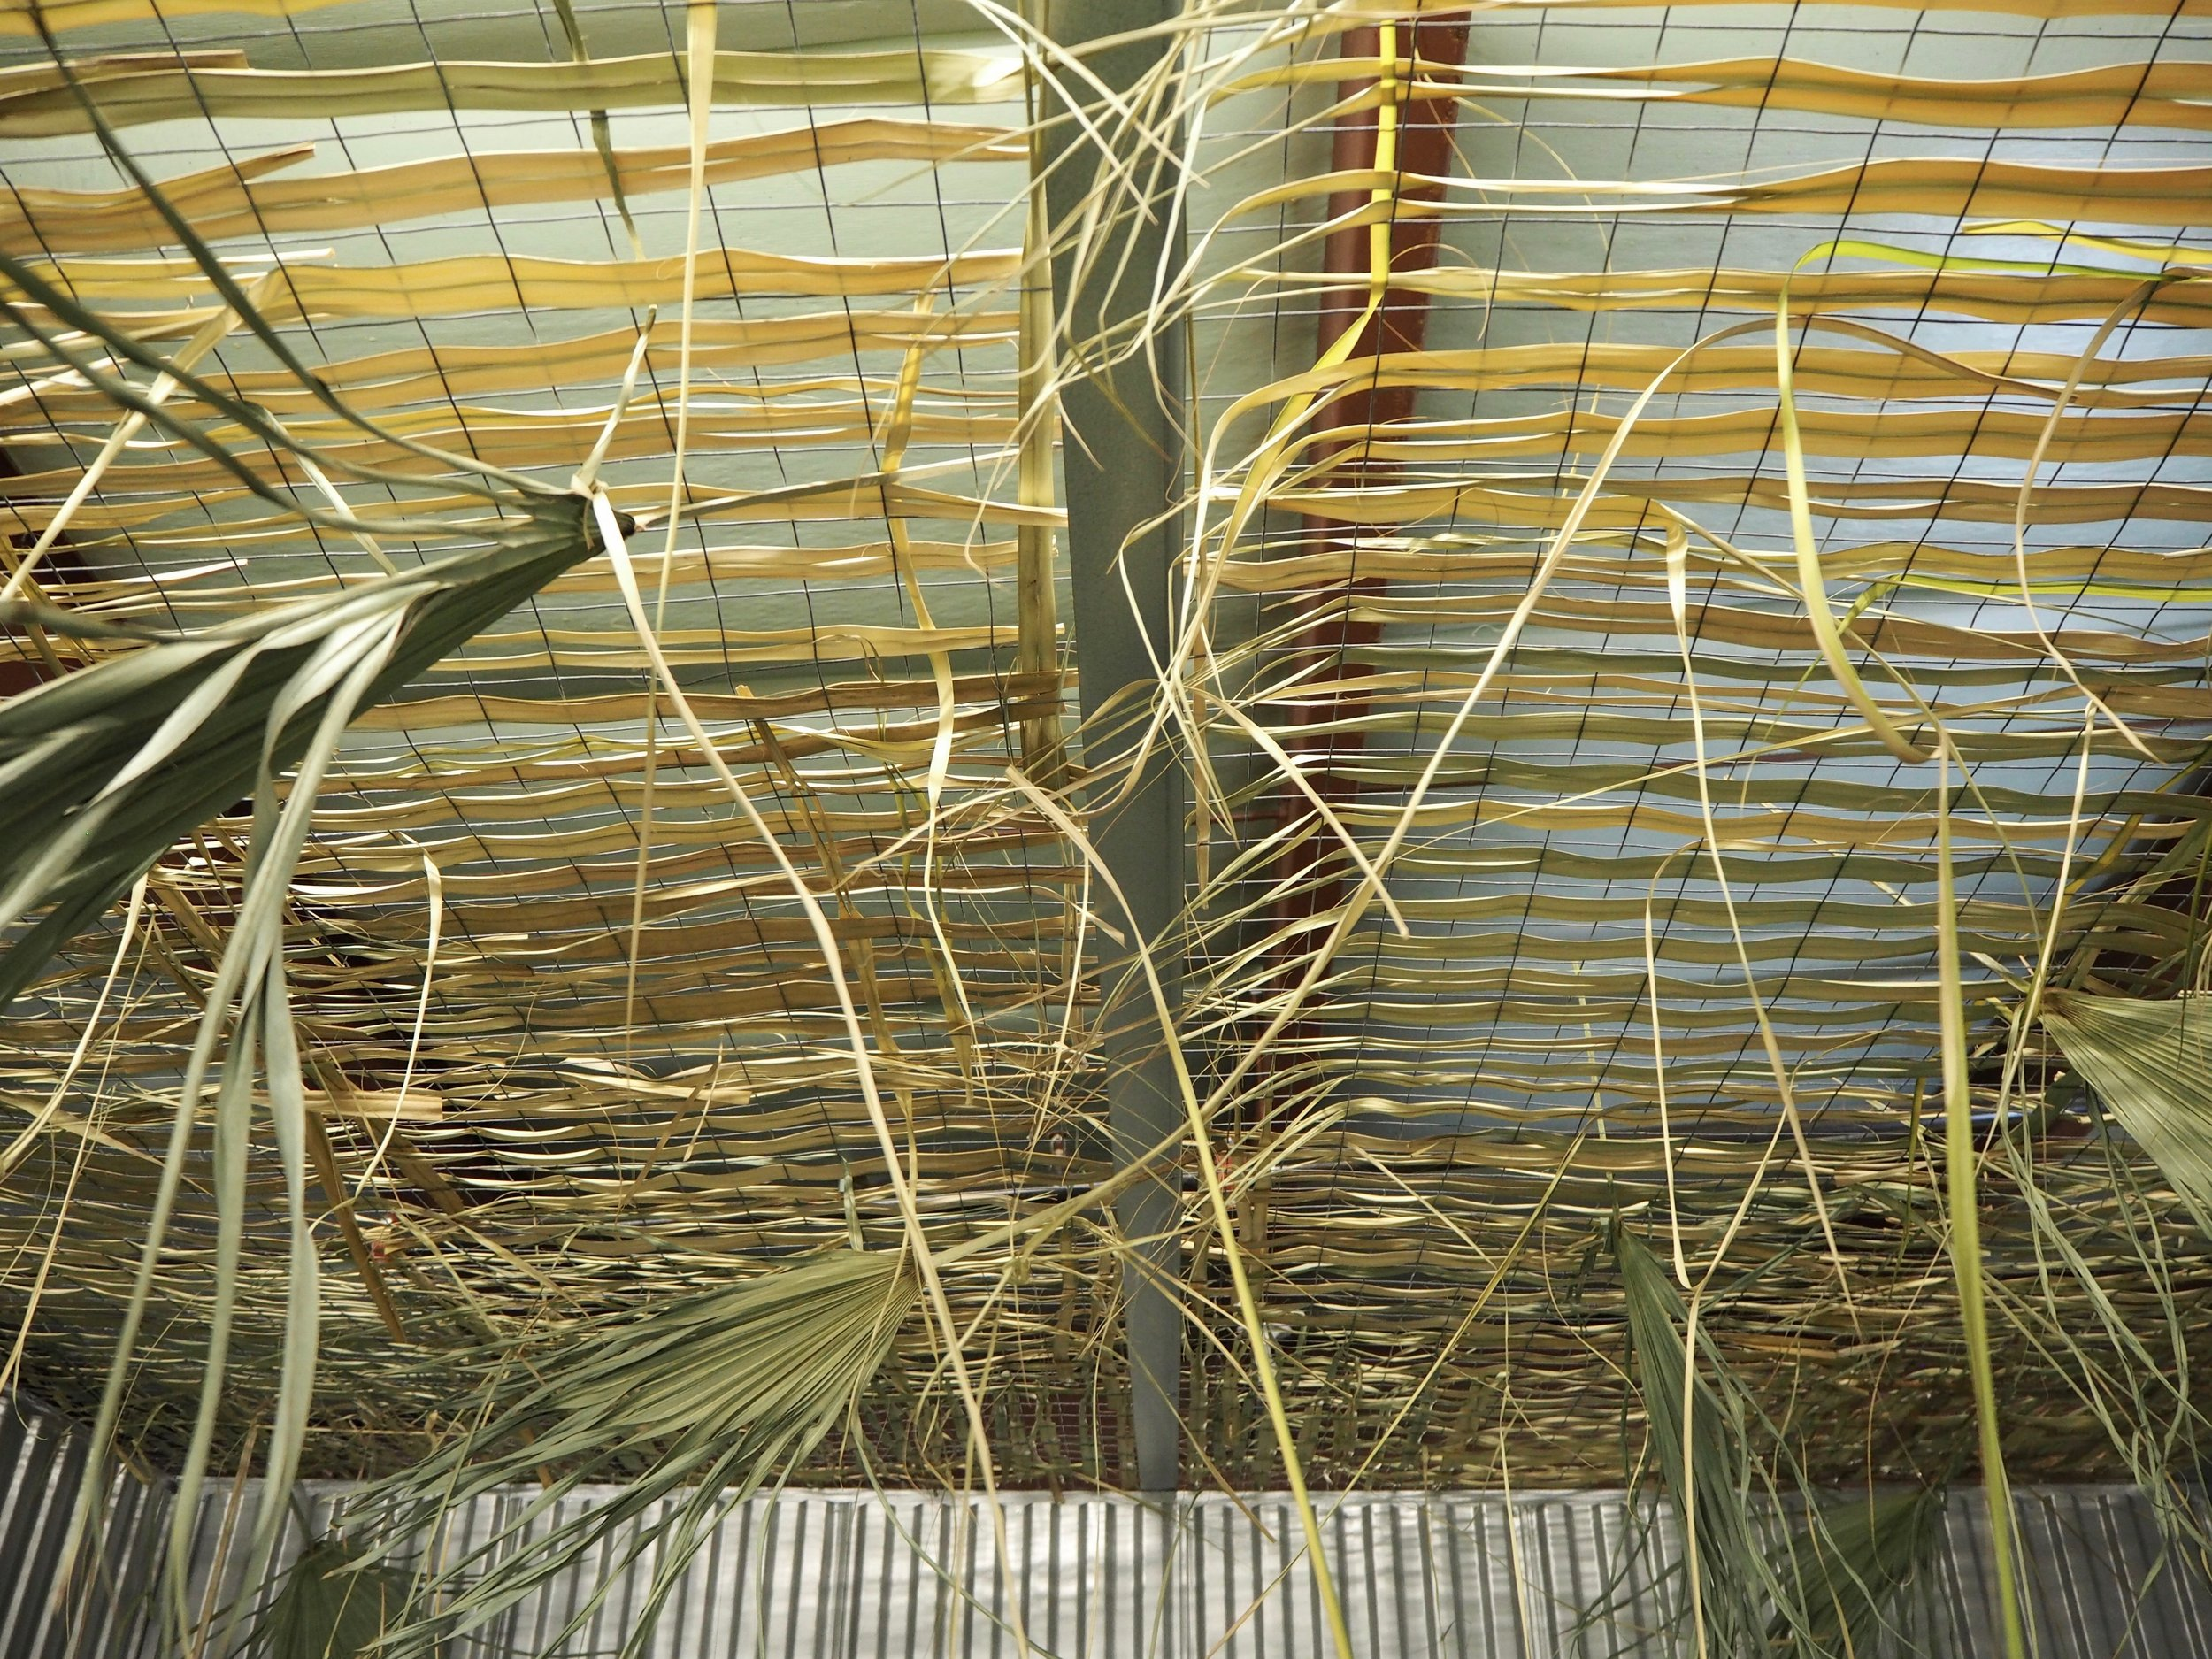 Jzeng_Oasis installation view.jpg